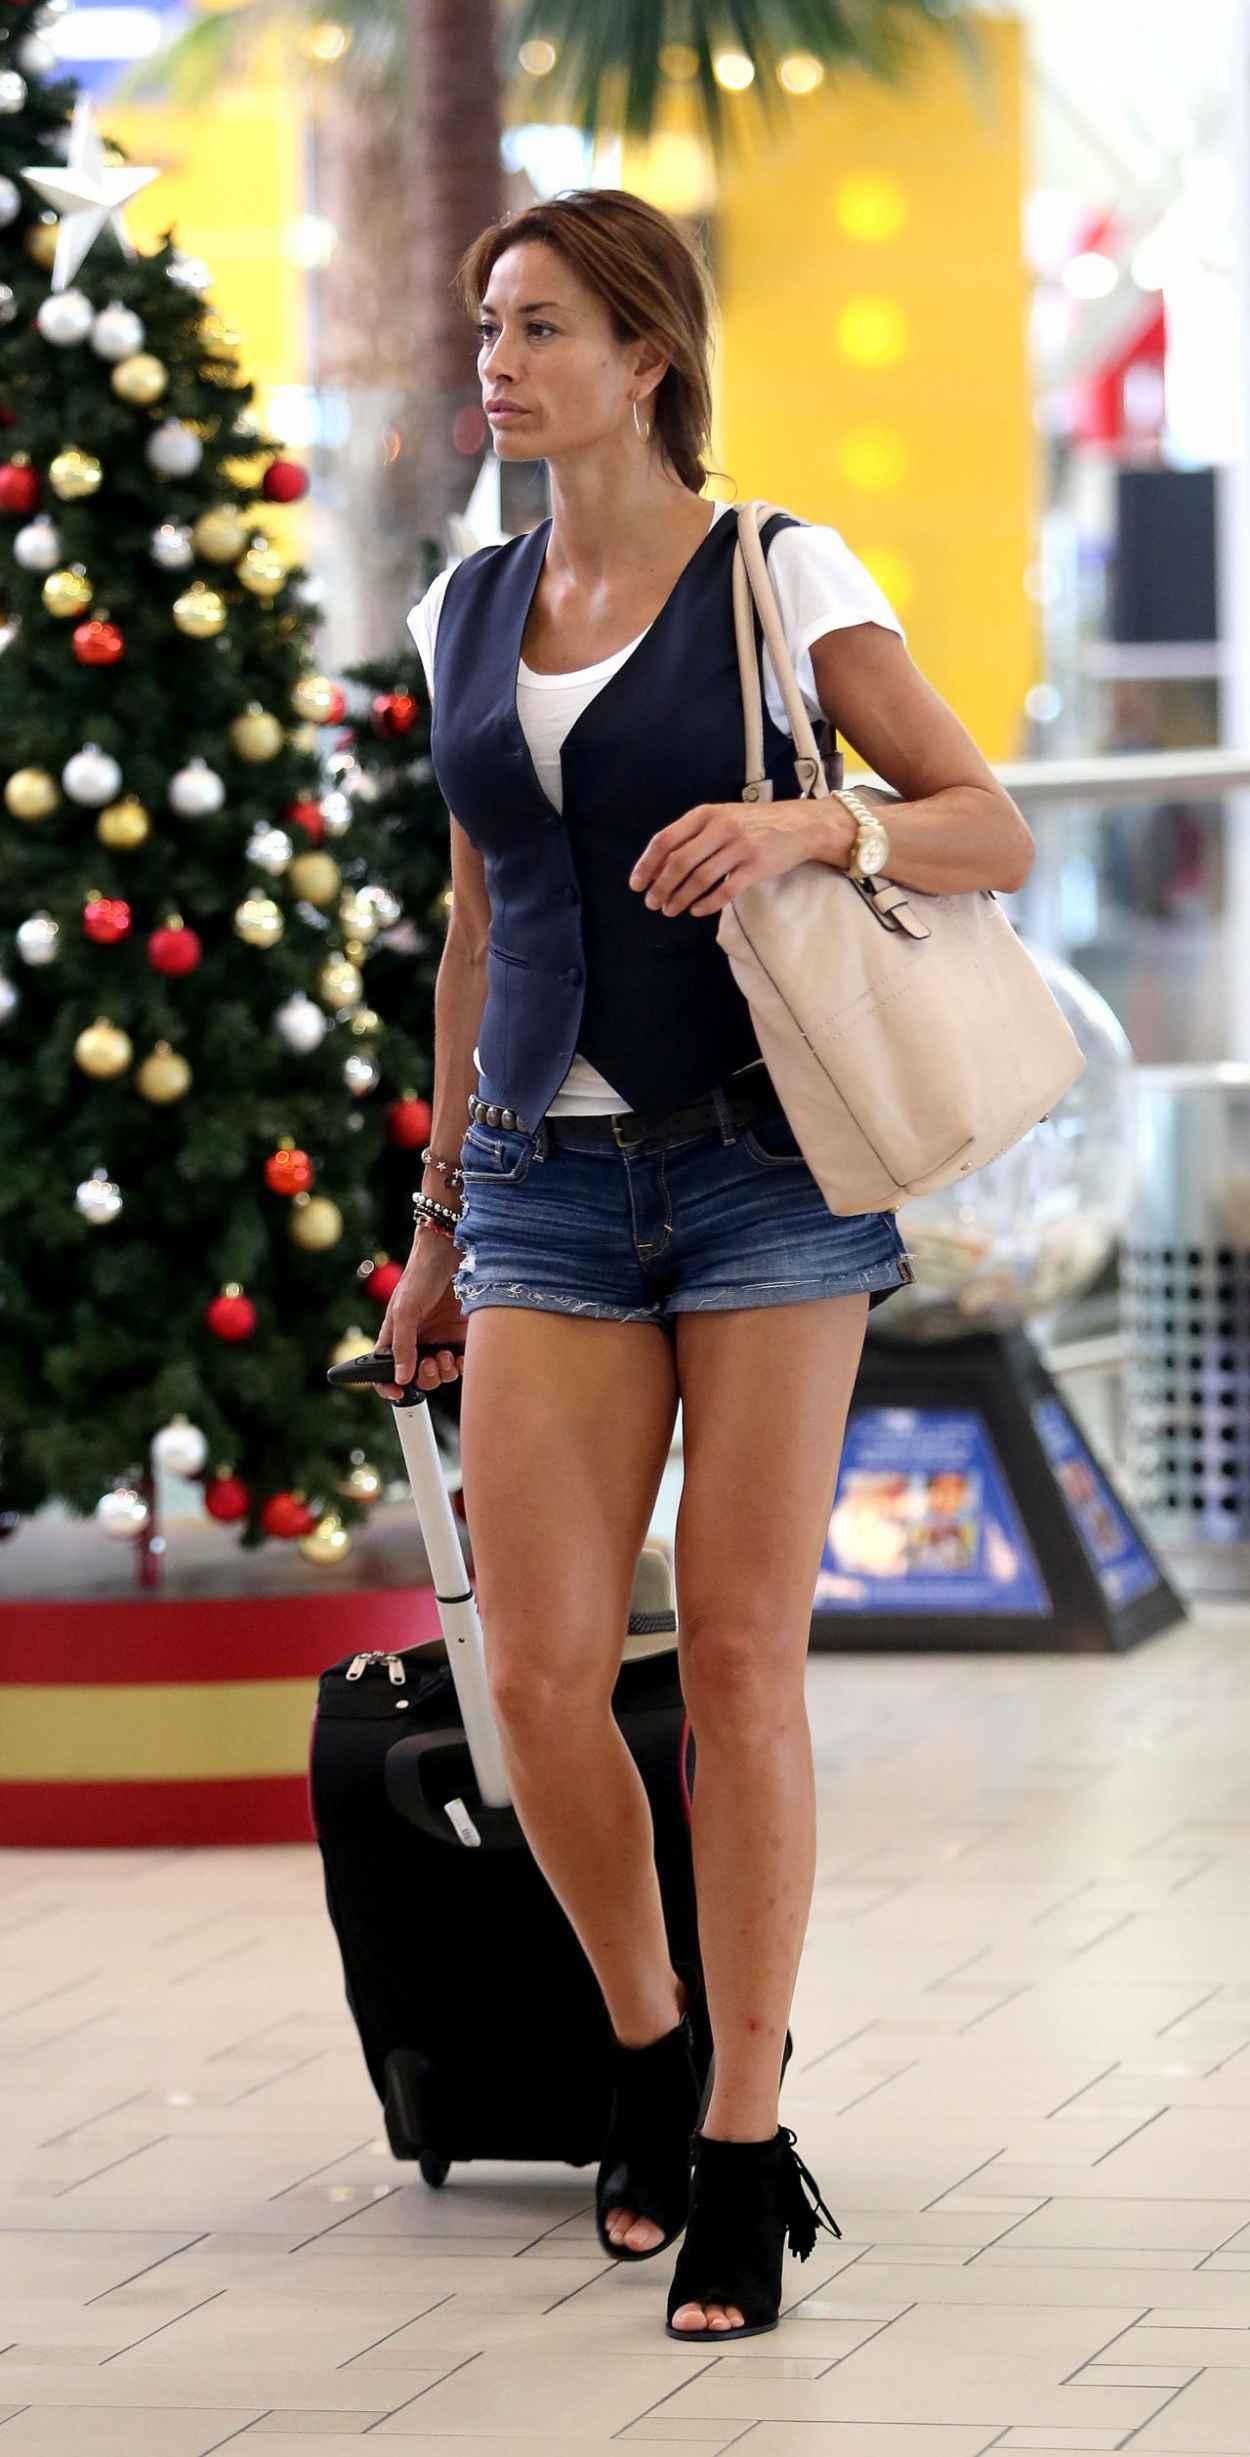 Melanie Sykes Leggy in Jeans Shorts – at Brisbane Airport ...